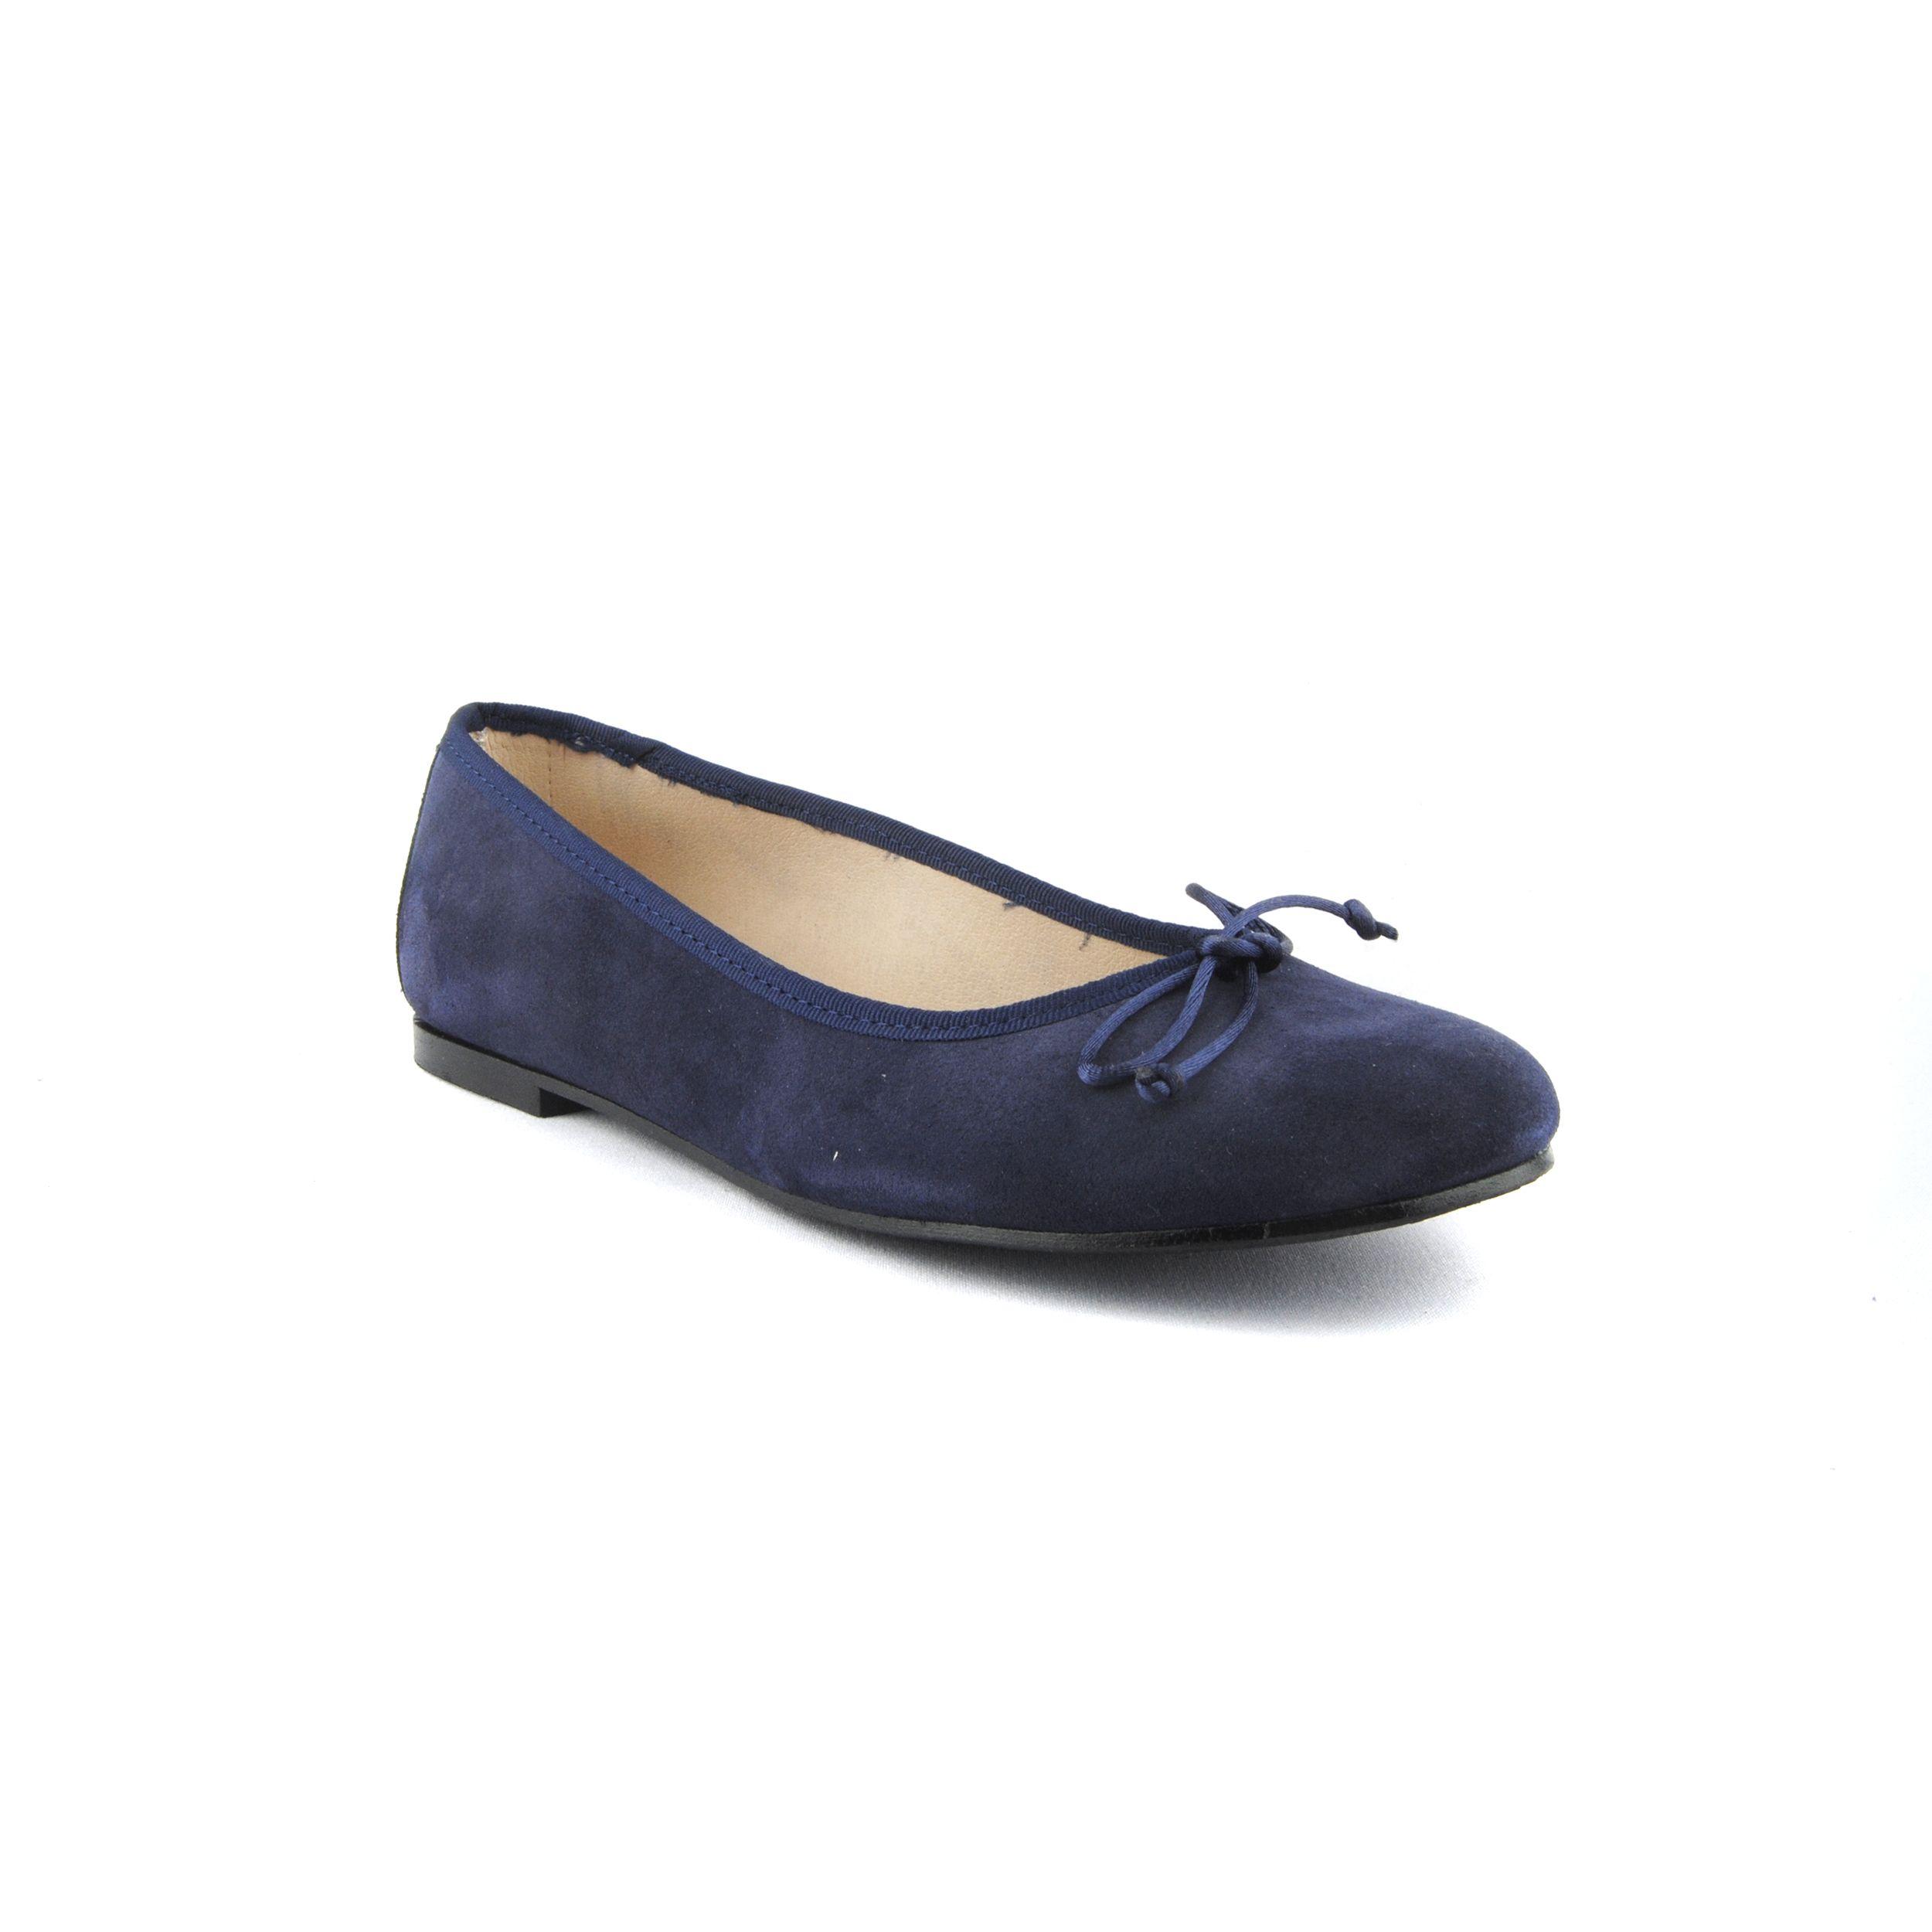 Purapiel Ballet Flat in Blue